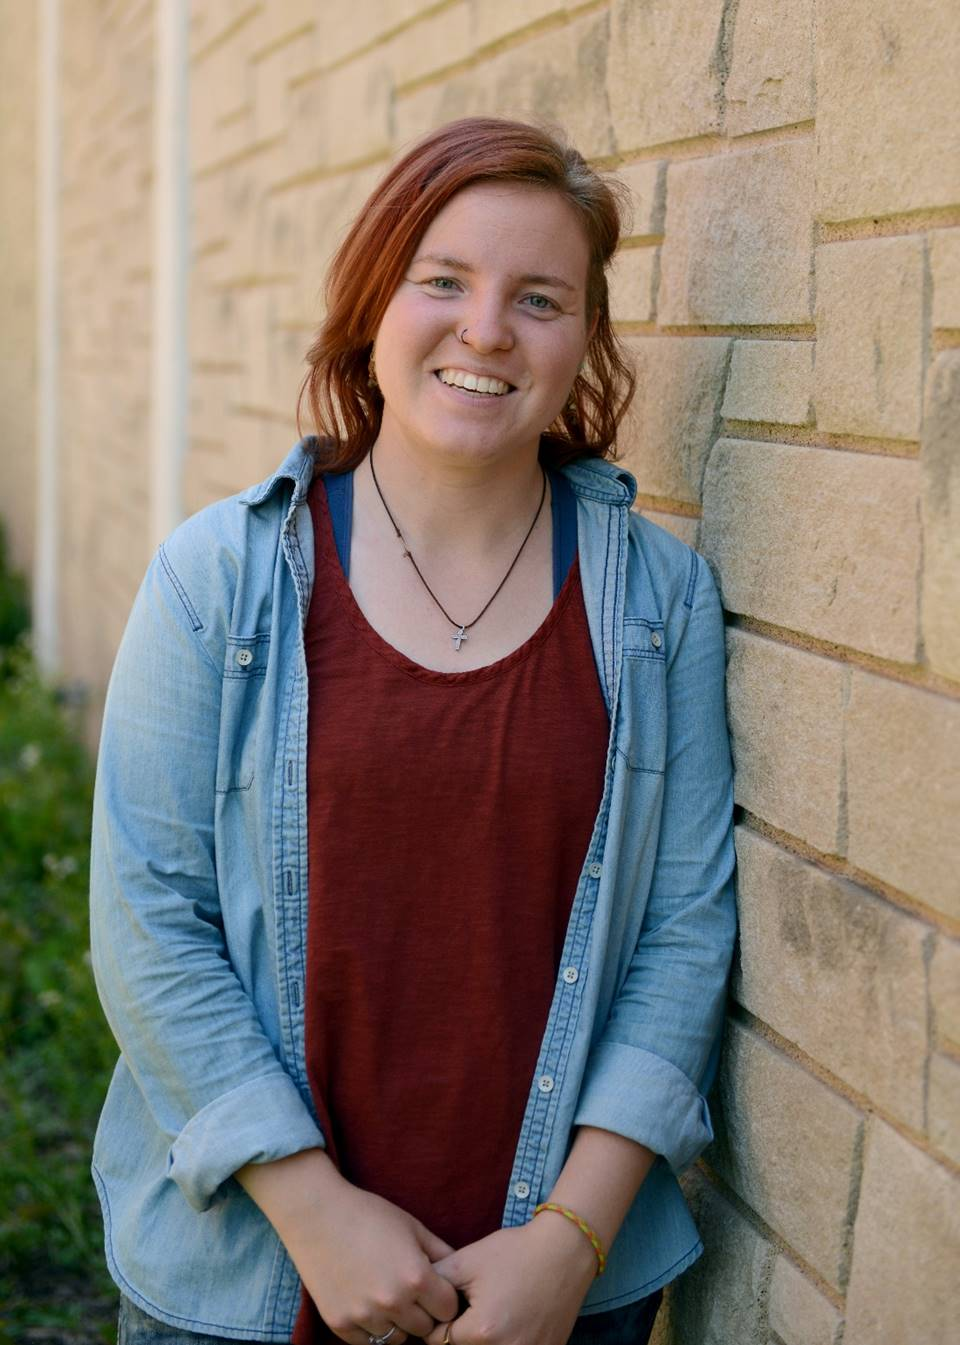 Grace Corbin - Interning: Northeast Minneapolis UMC with Rev. Sarah LawtonSchool: Augsburg College (Minneapolis)Home church: Faith Lutheran Church (Grantsburg, Wisconsin)